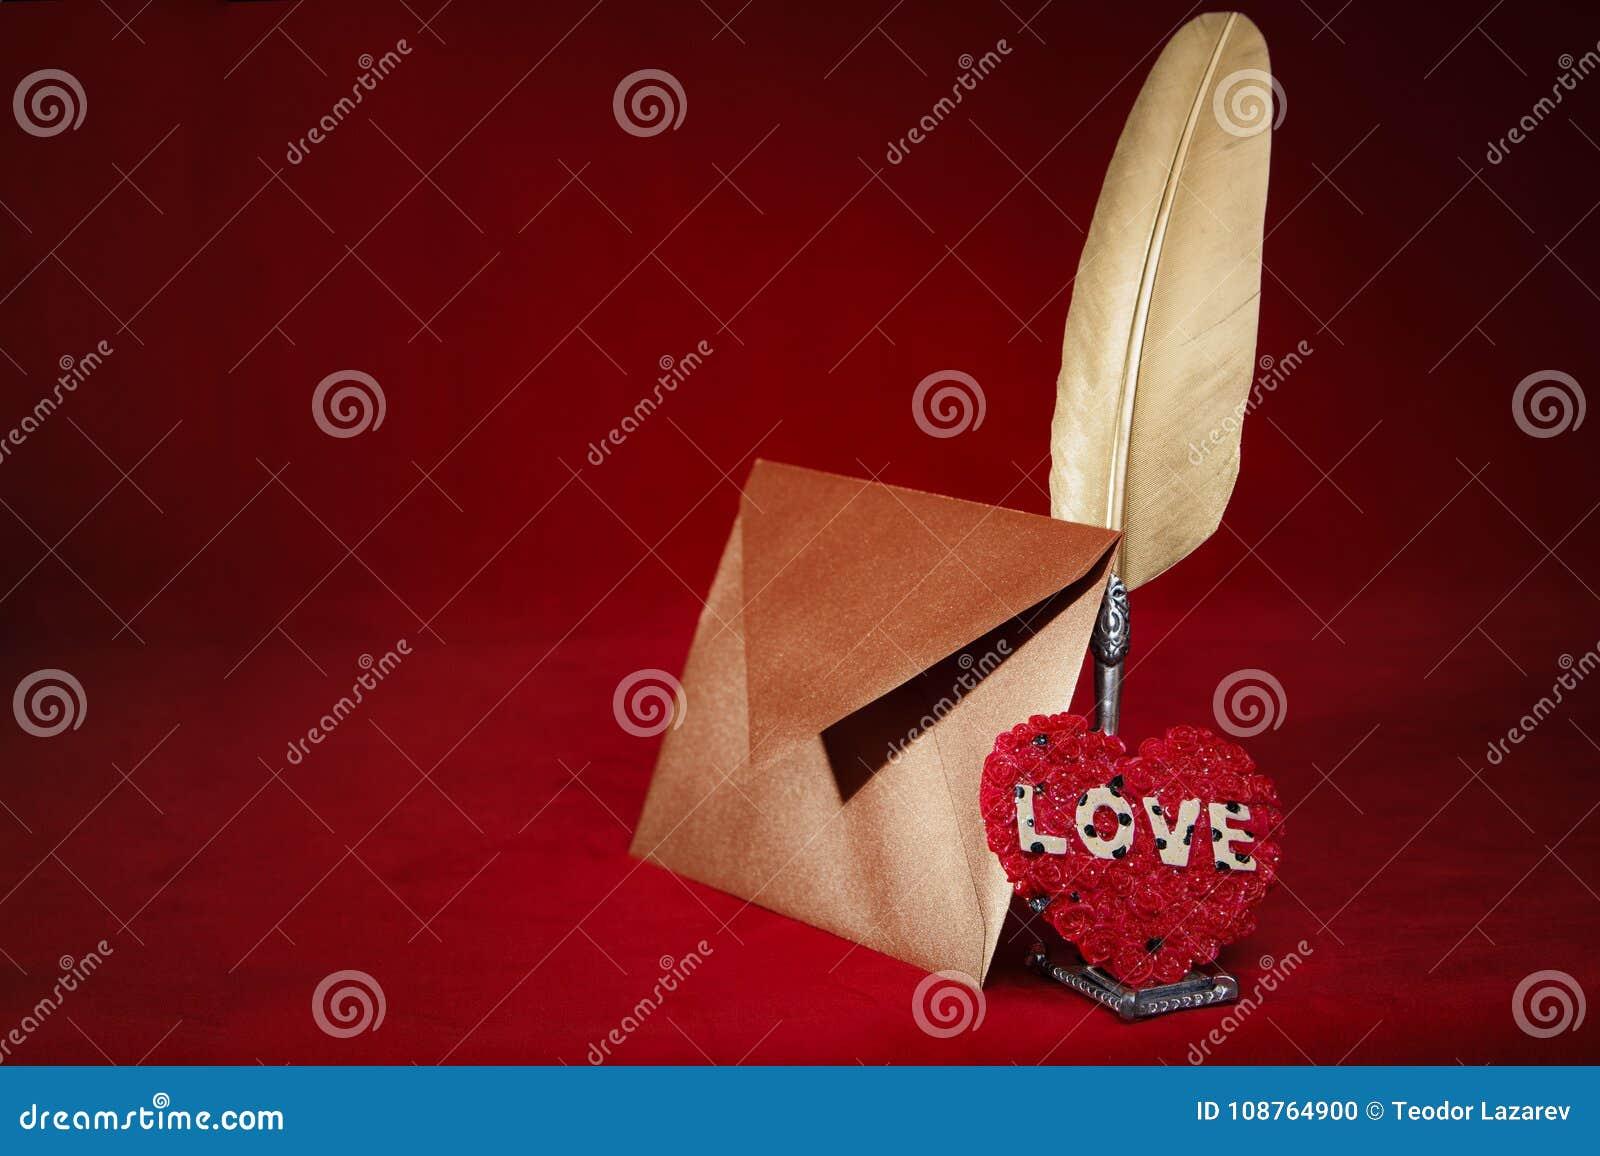 beautiful writings on love